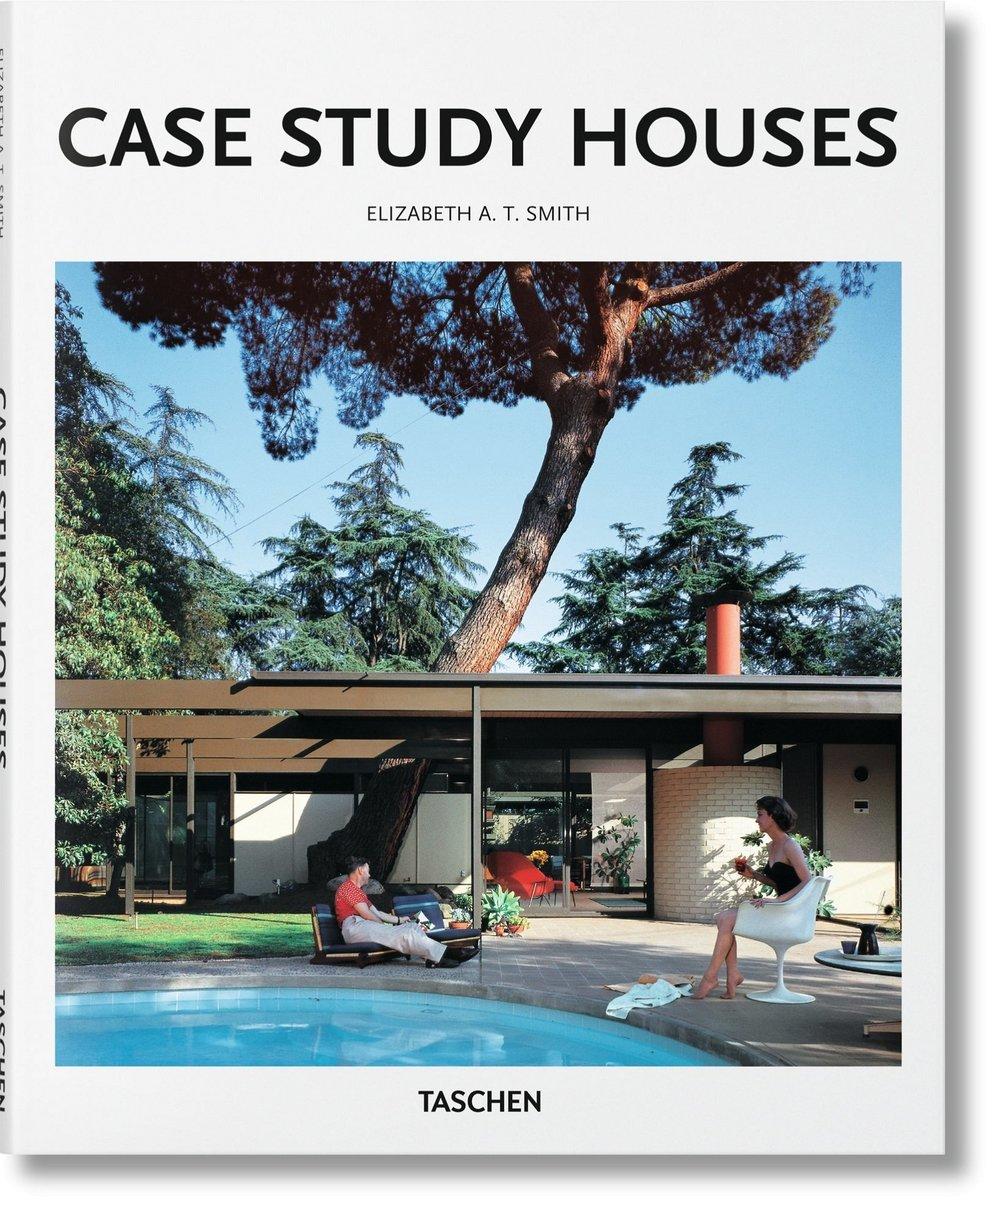 Copy of Case Study Houses